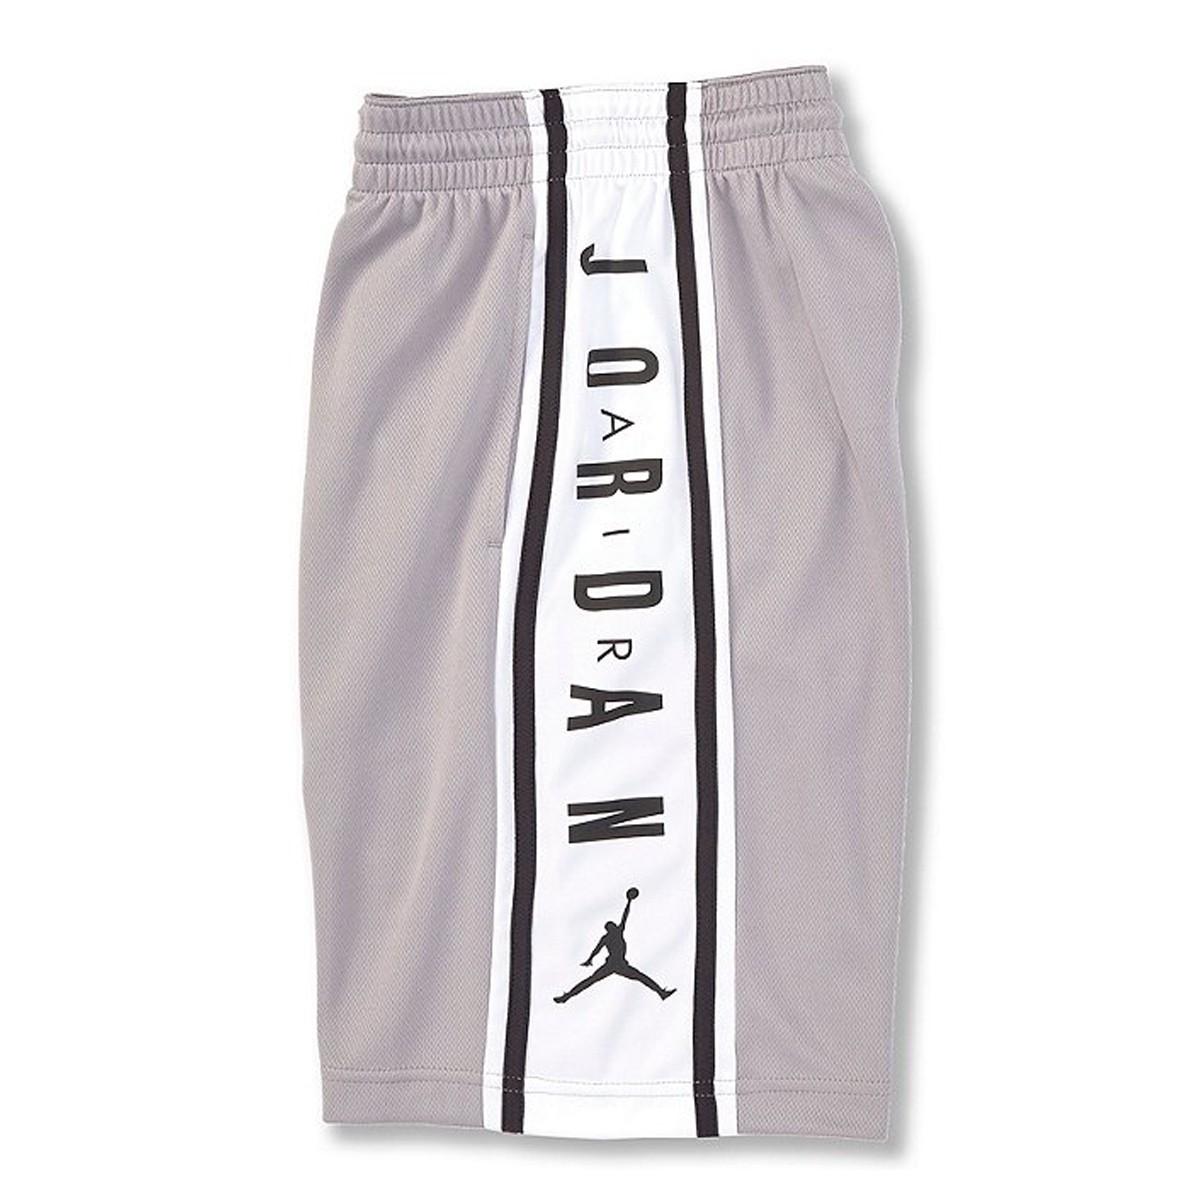 Pantalón Jordan HBR BBall 'Grey'-957115-G4R